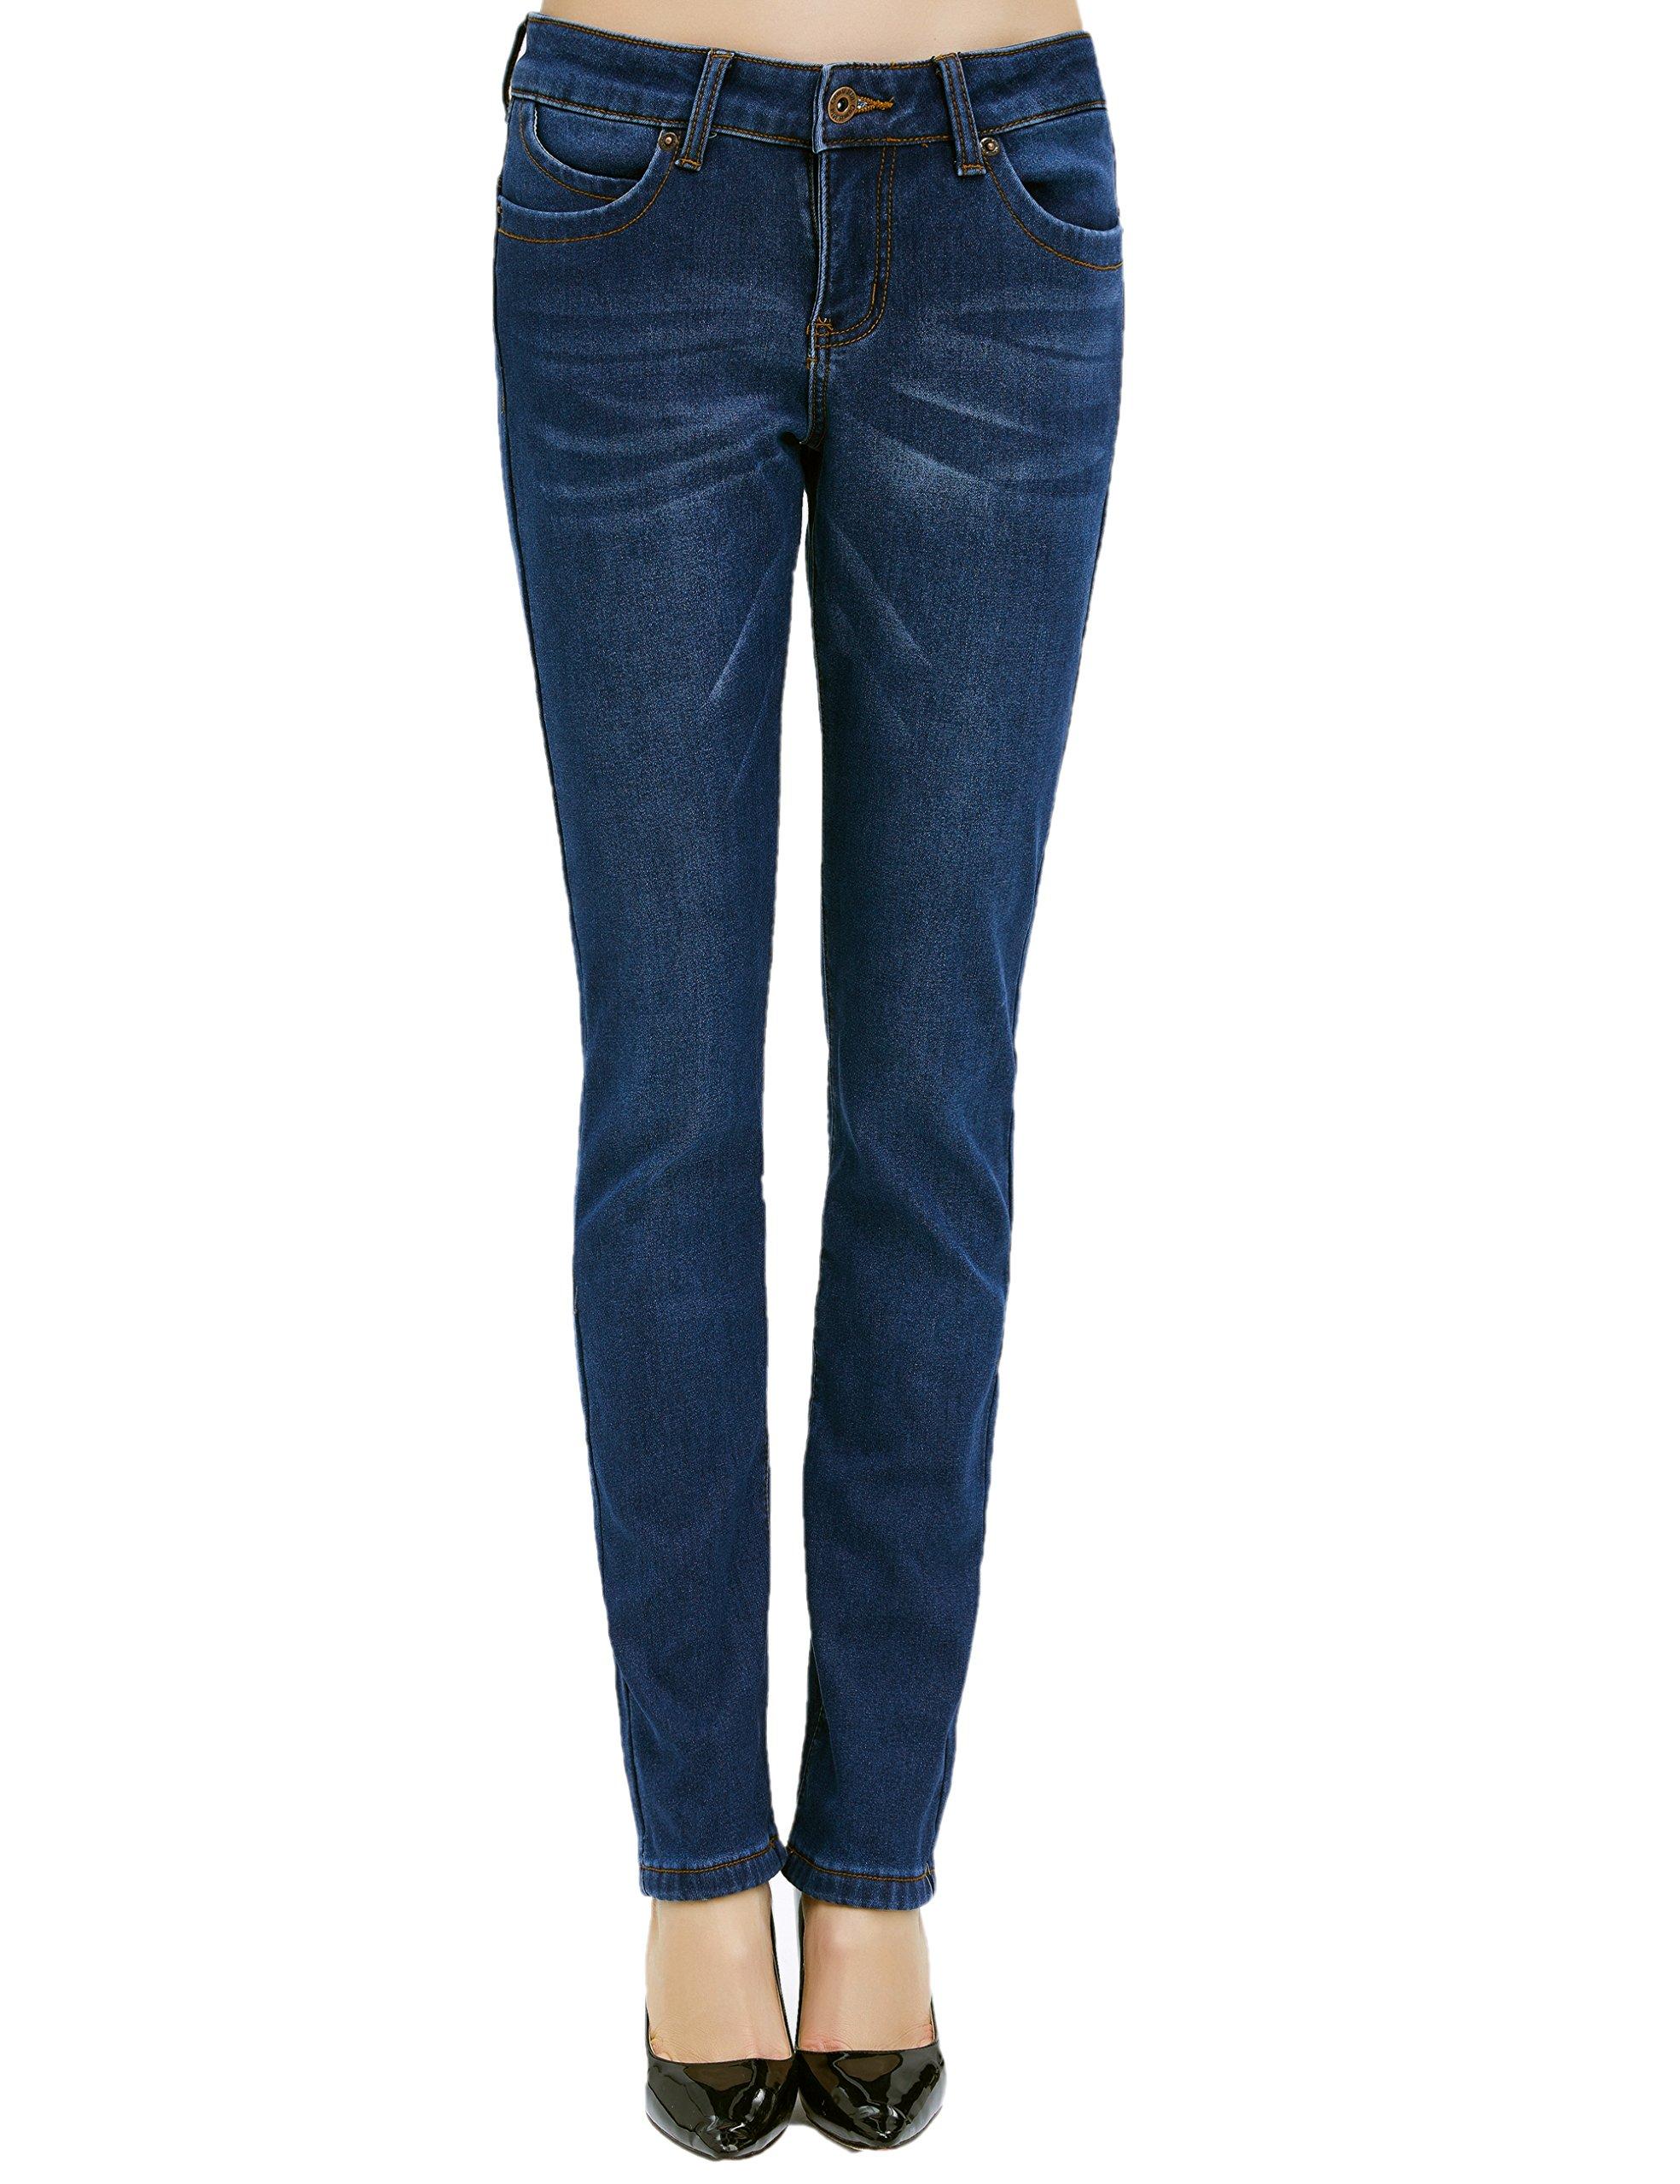 Camii Mia Women's Winter Slim Fit Fleece Jeans (W29 x L32, Blue (new size))